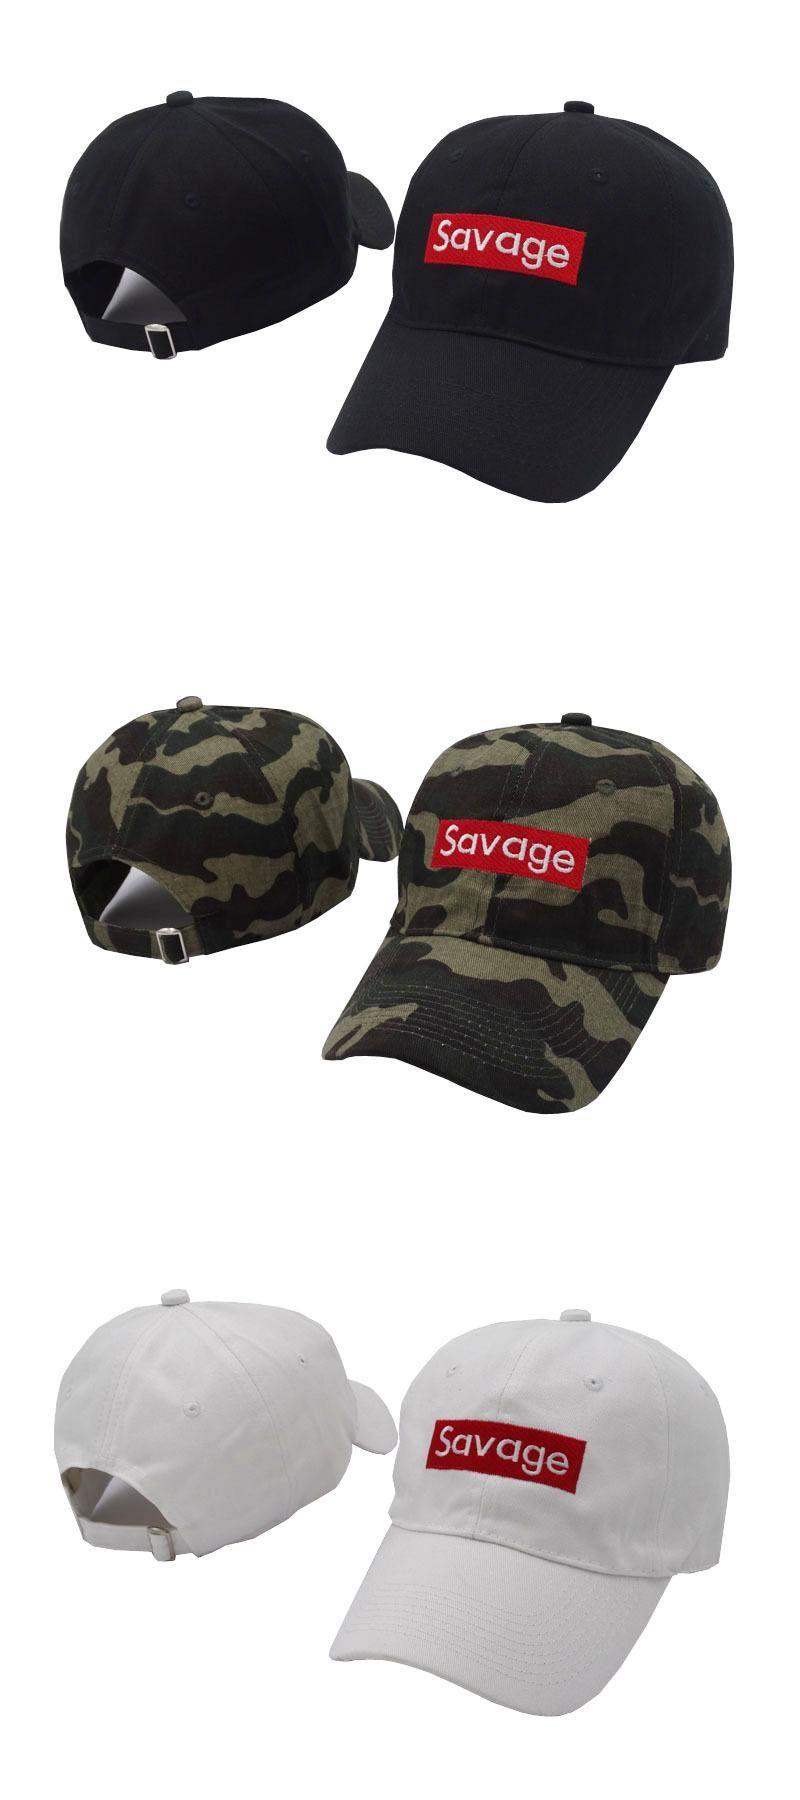 67c5f5ad291  Visit to Buy  Savage Baseball Cap Embroidery Men Dad Hat Cotton Bone Women  Snapback